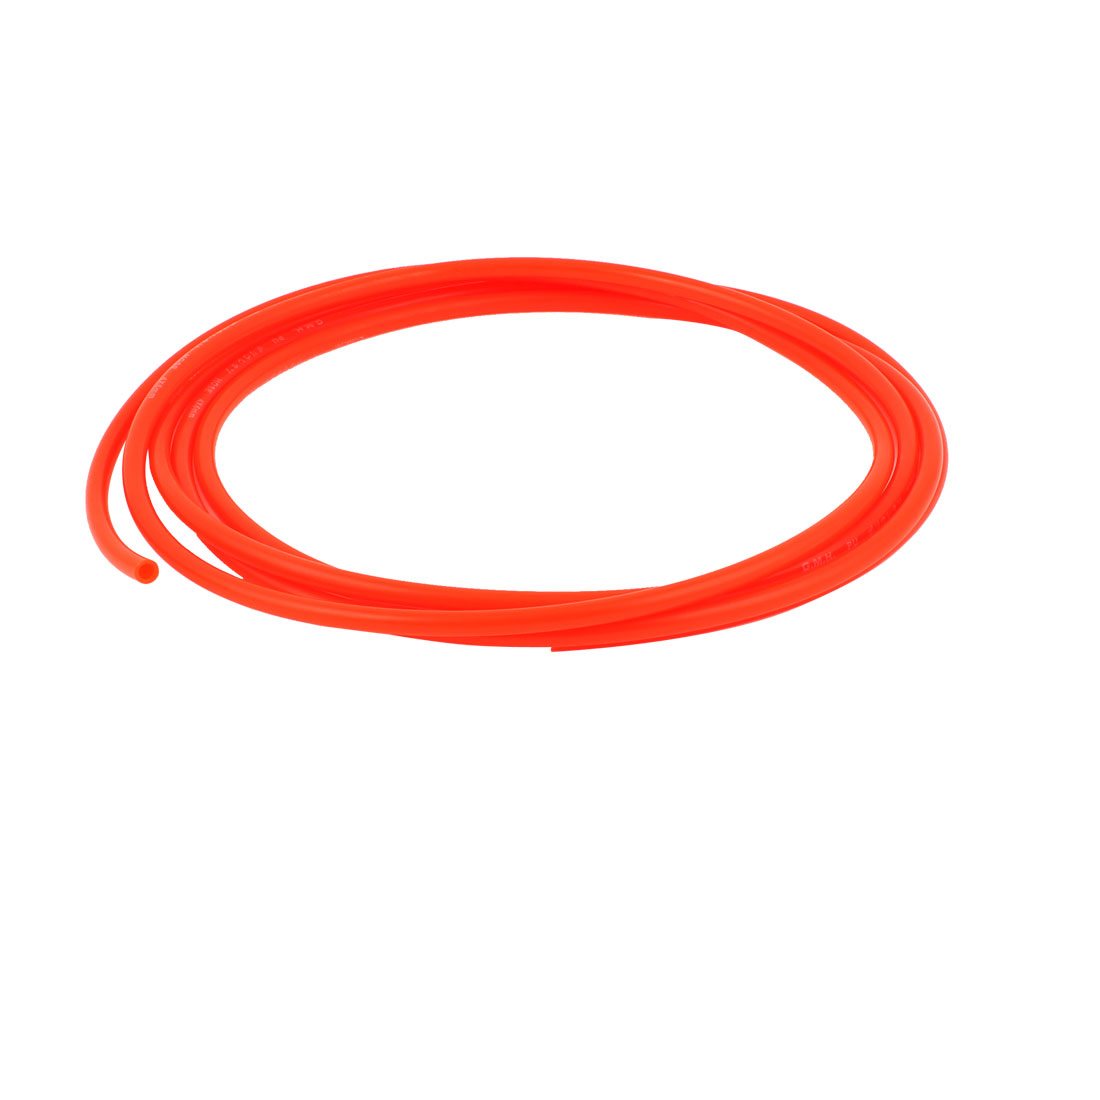 6mm x 4mm Fleaxible PU Tube Pneumatic Polyurethane Hose 3 Meters Long Orange